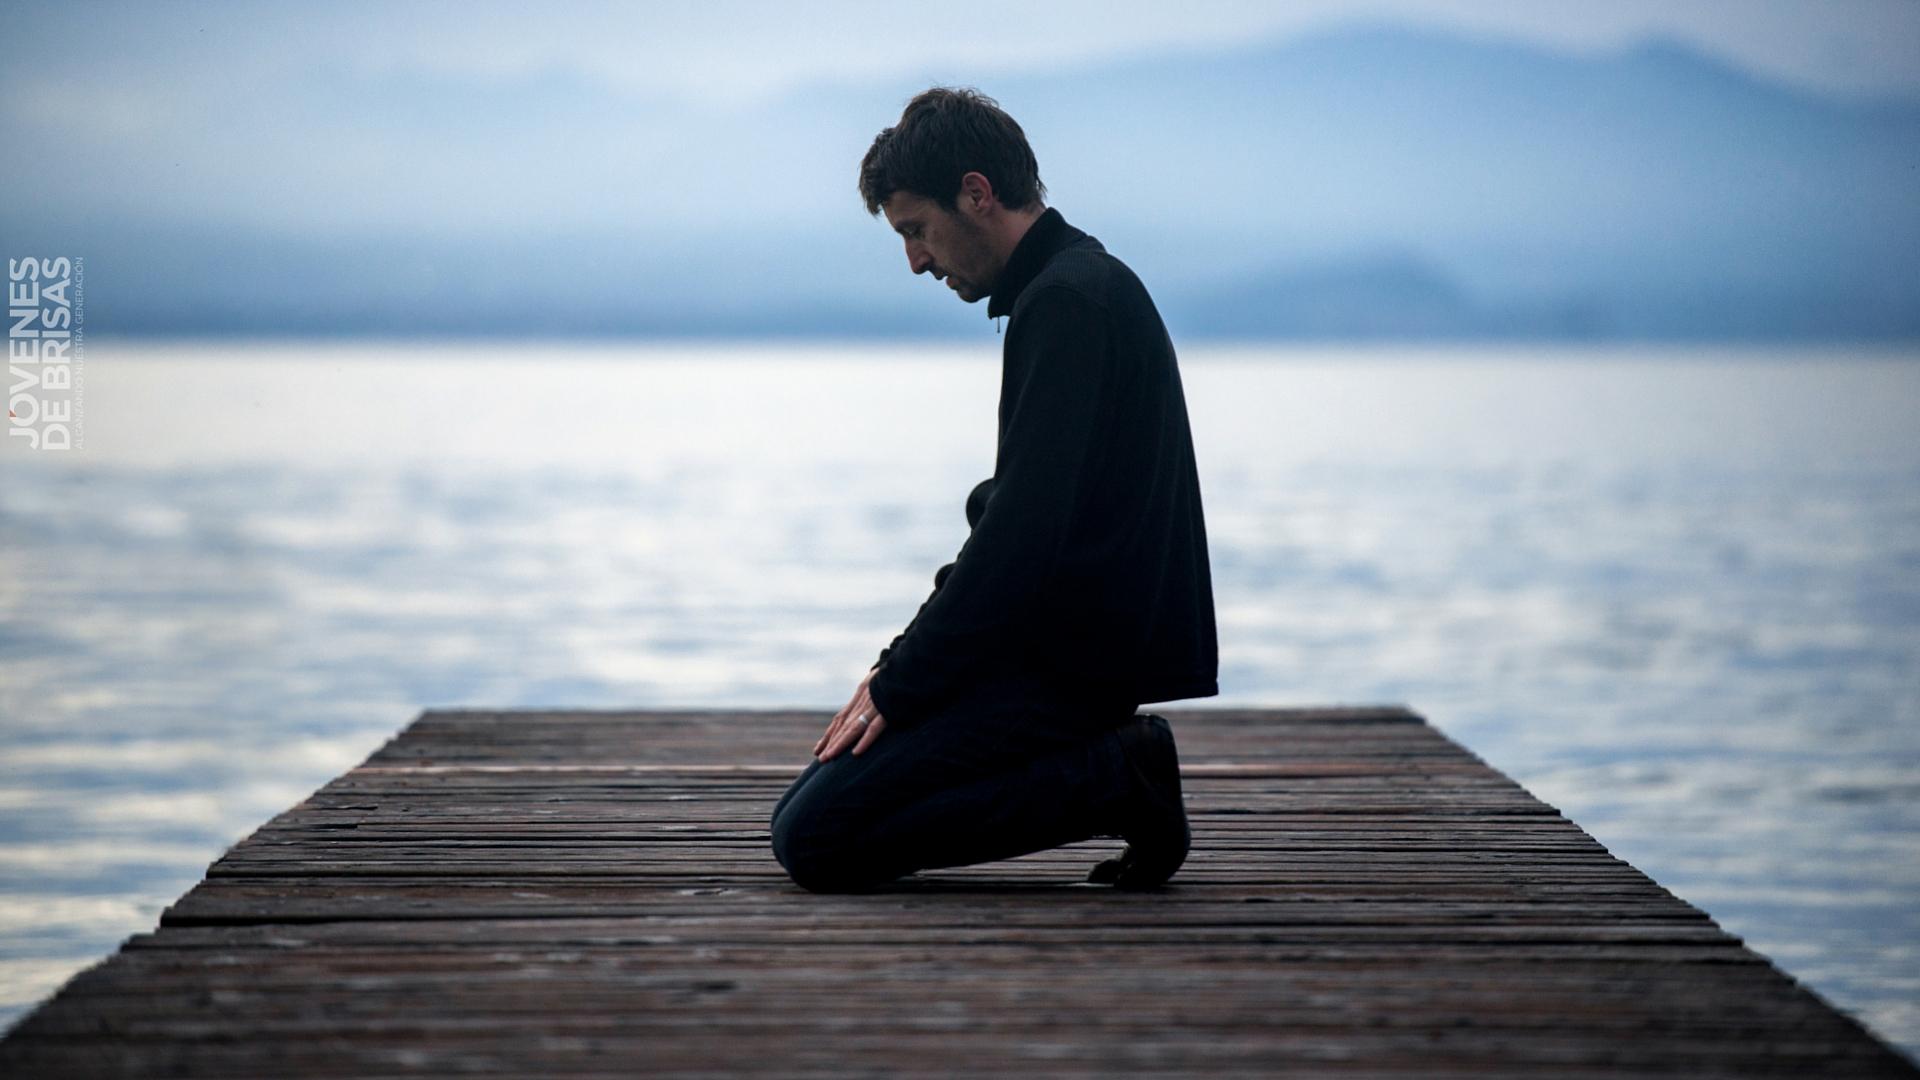 40 preguntas: Examina tu relación con Dios